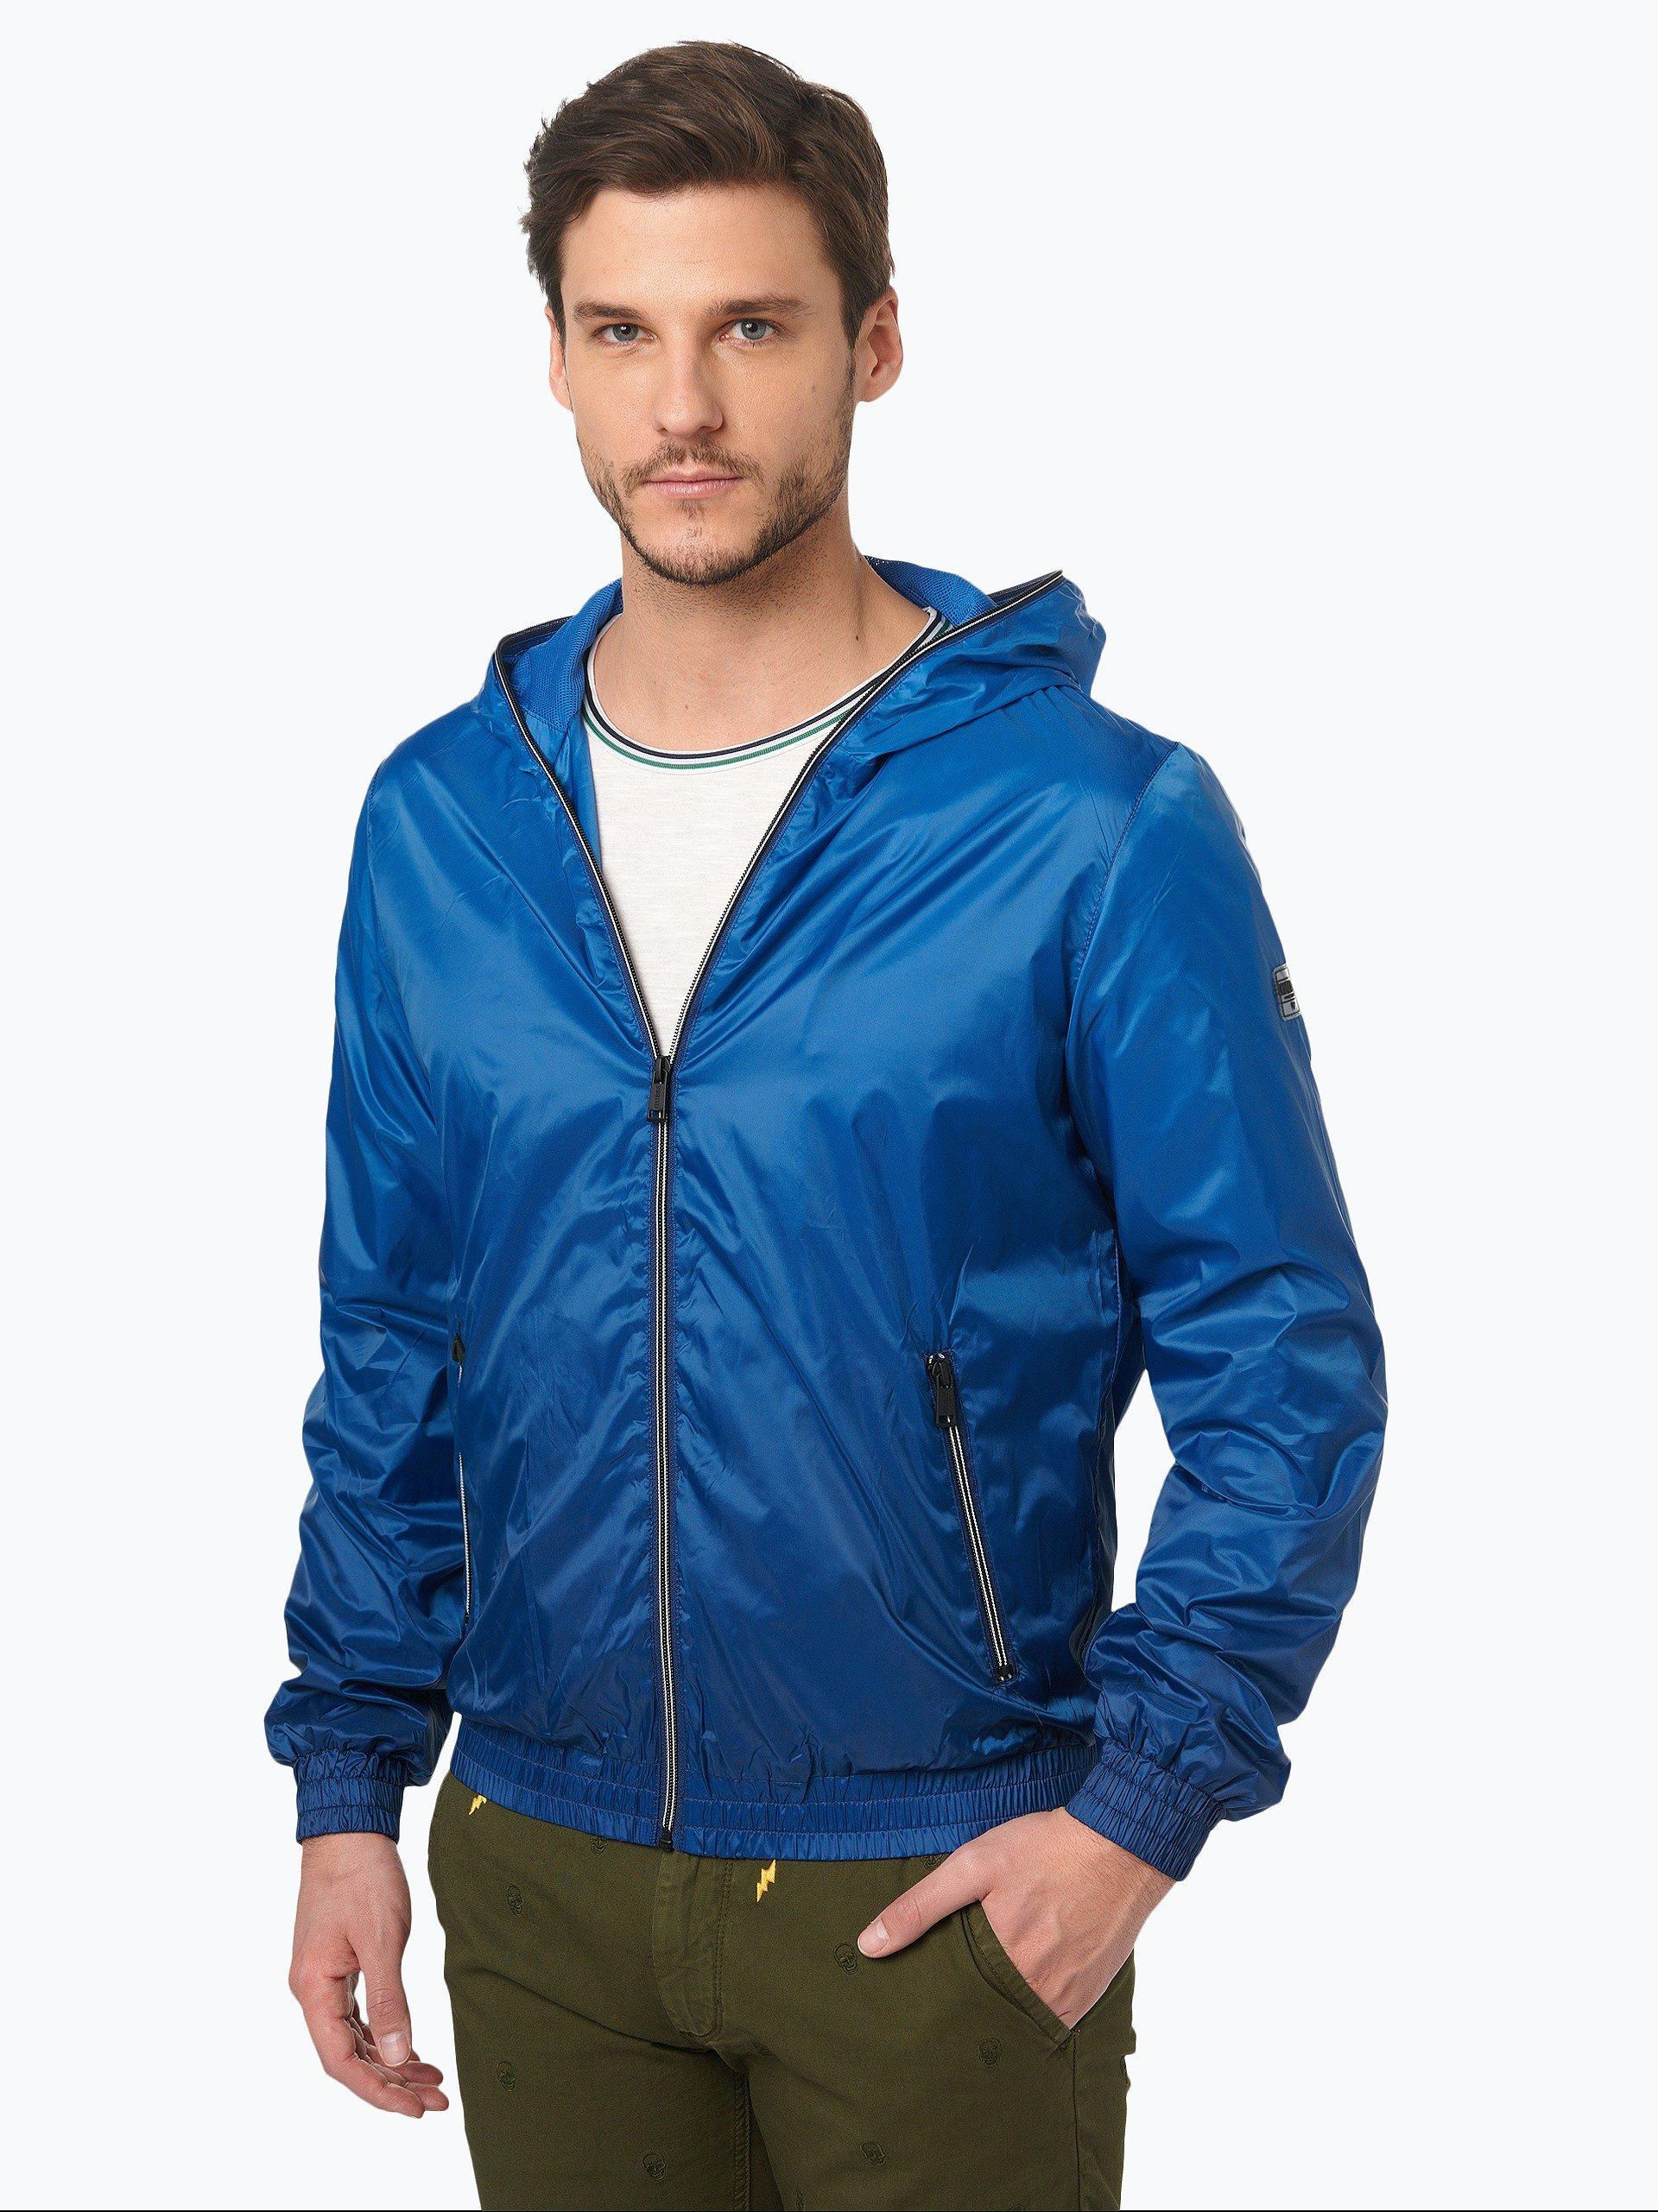 guess jeans herren jacke marine uni online kaufen peek